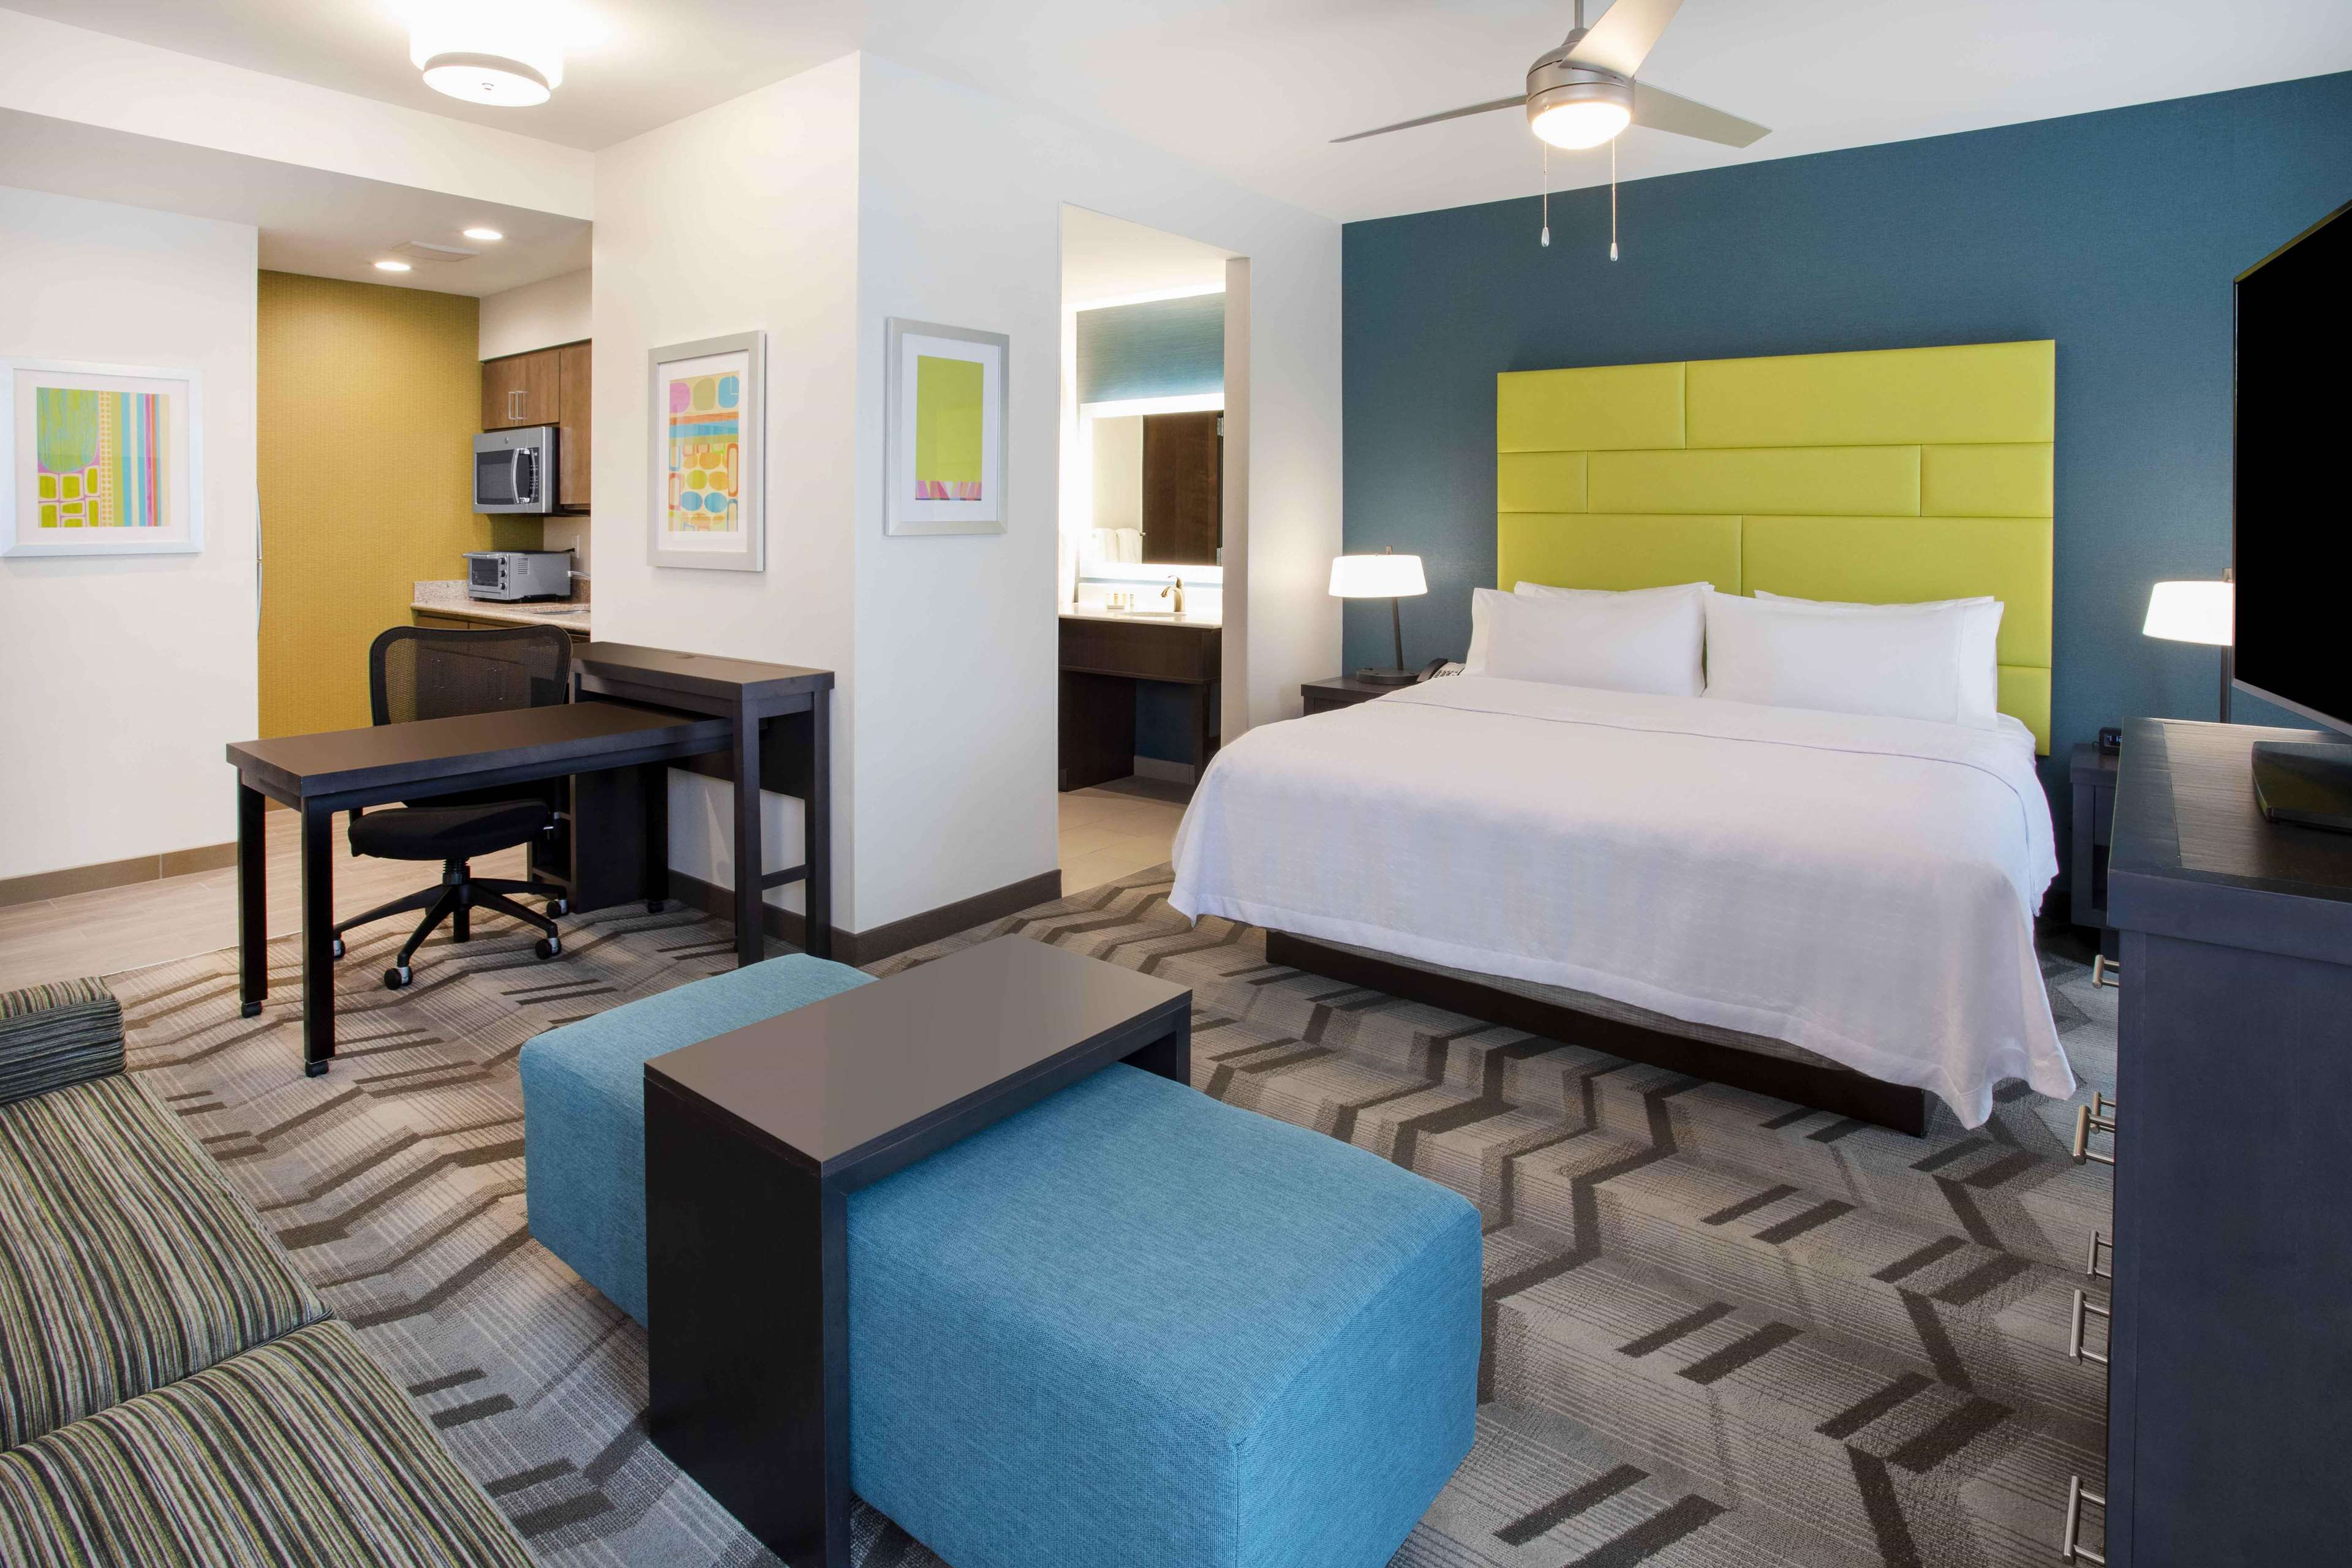 Homewood Suites by Hilton Edina Minneapolis image 27